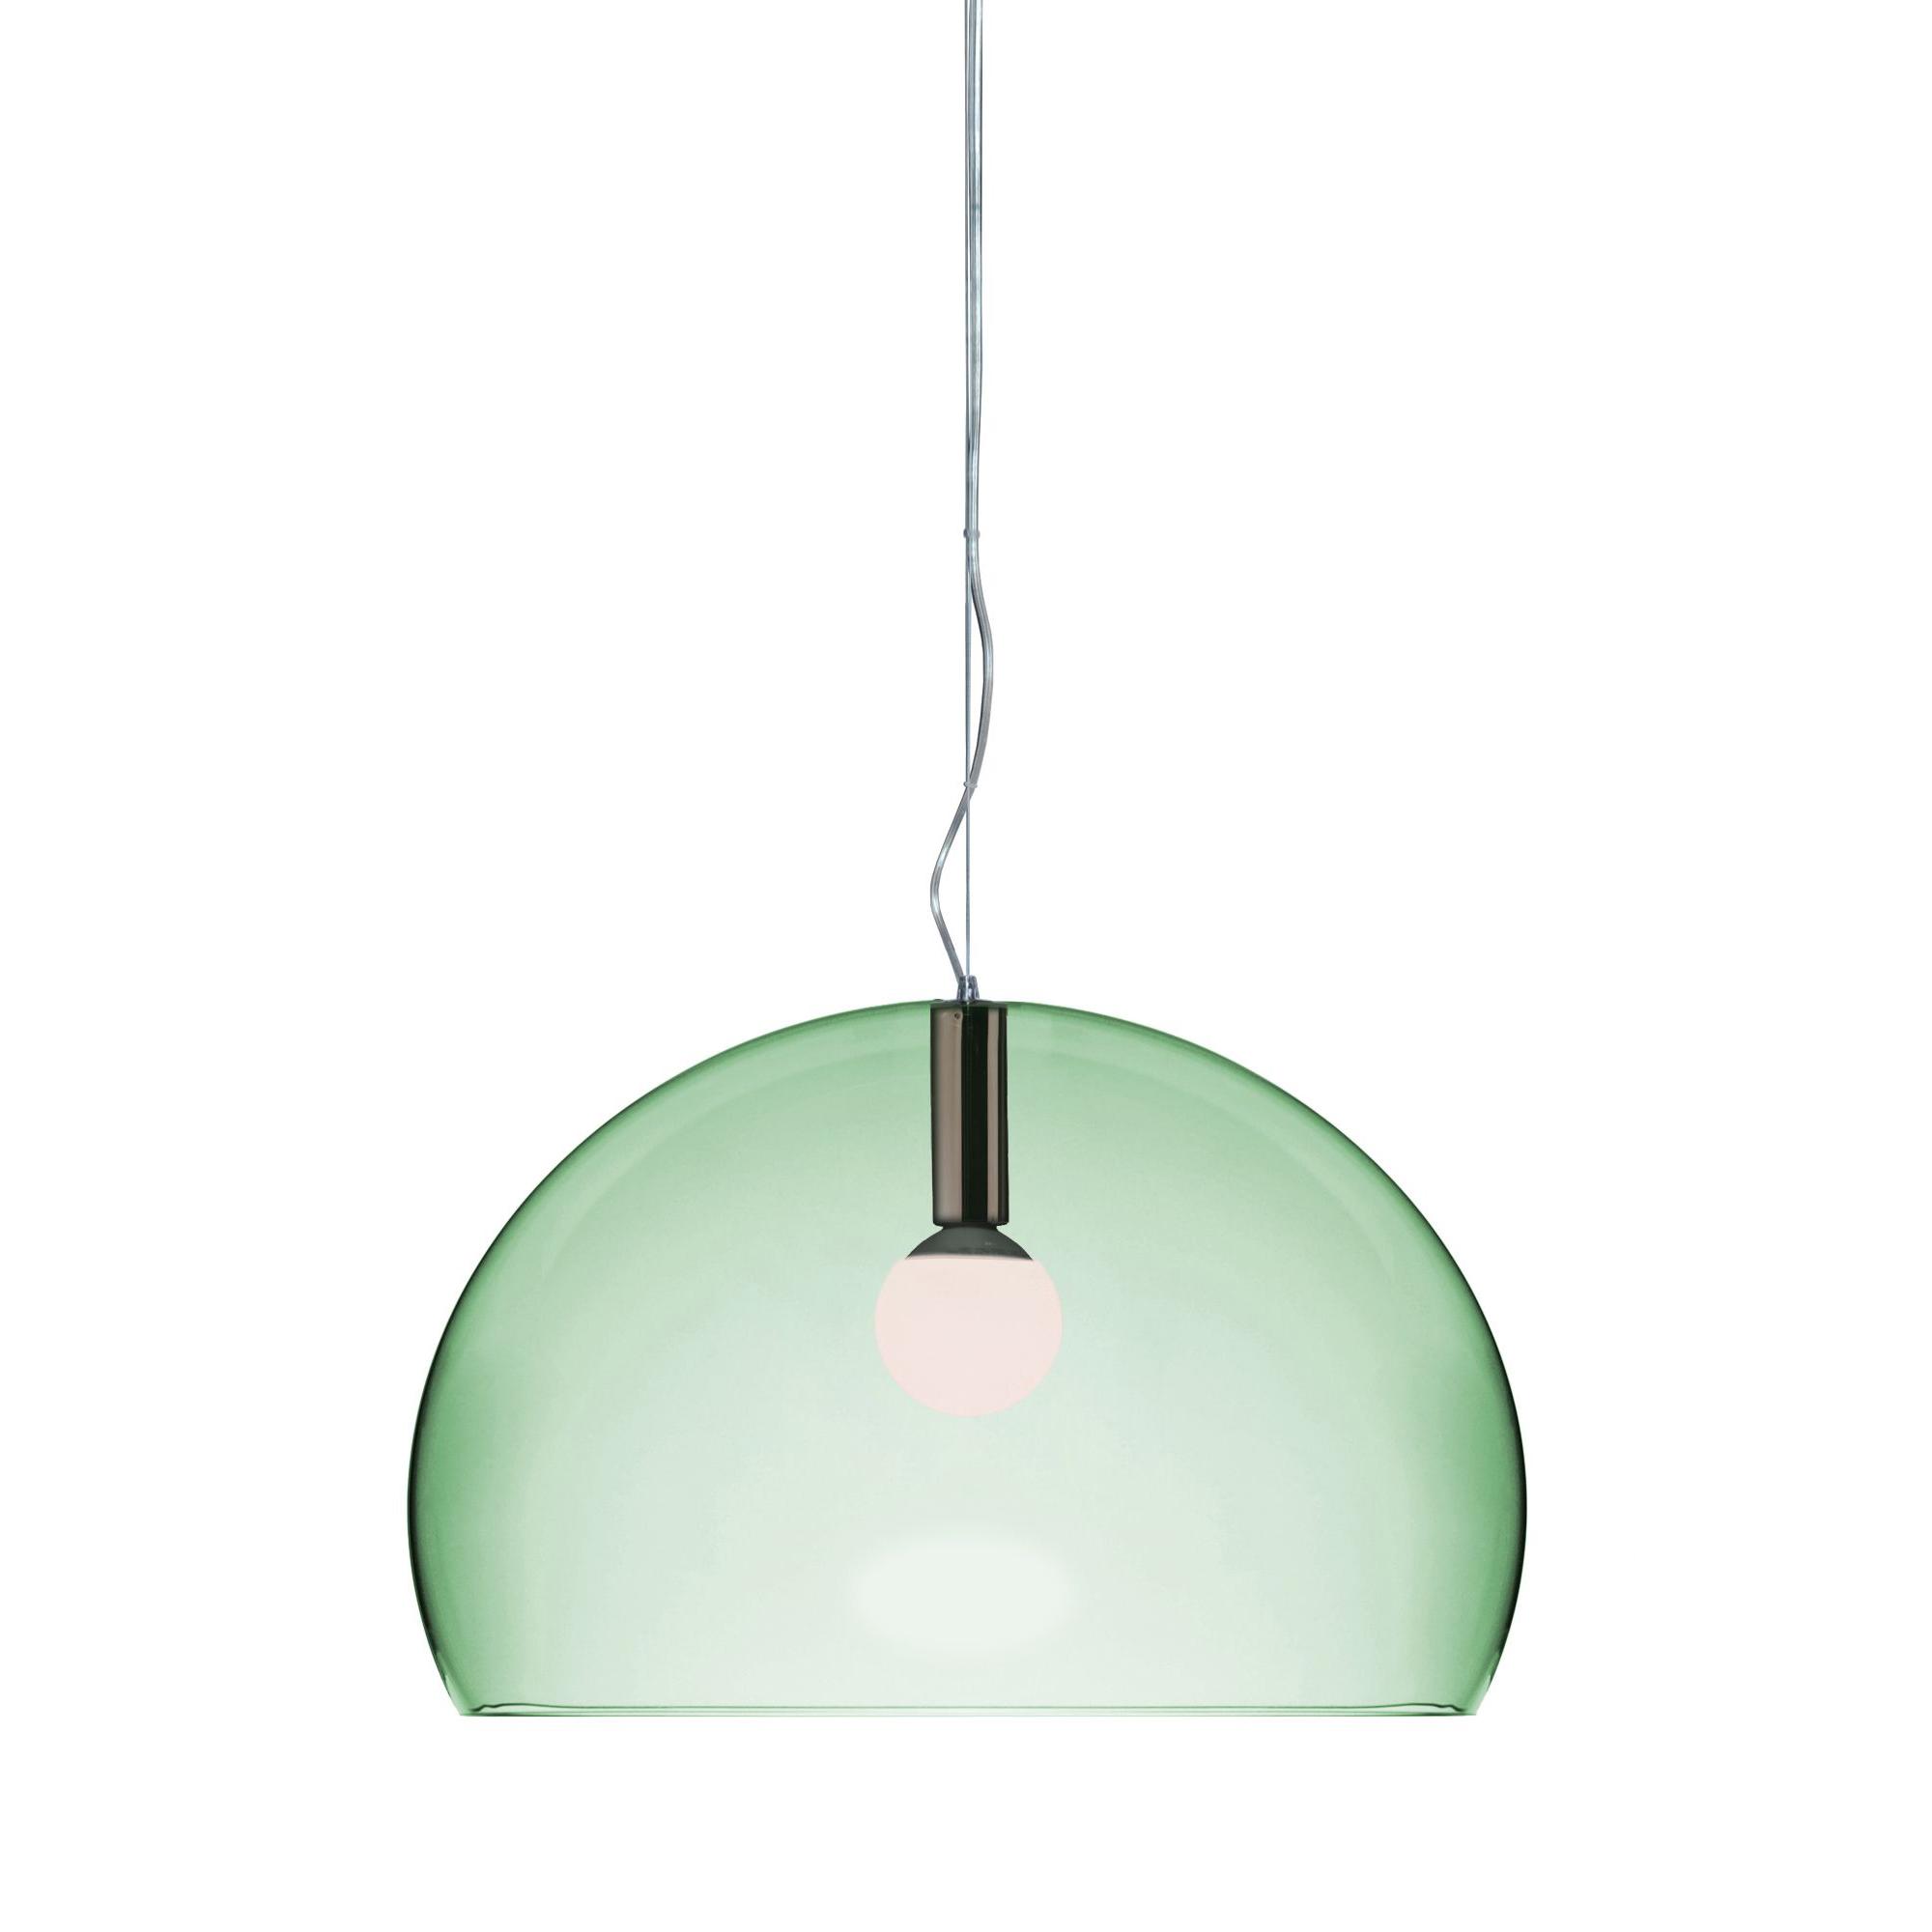 Buy online kartell big fly transparent led ceiling light aloadofball Gallery